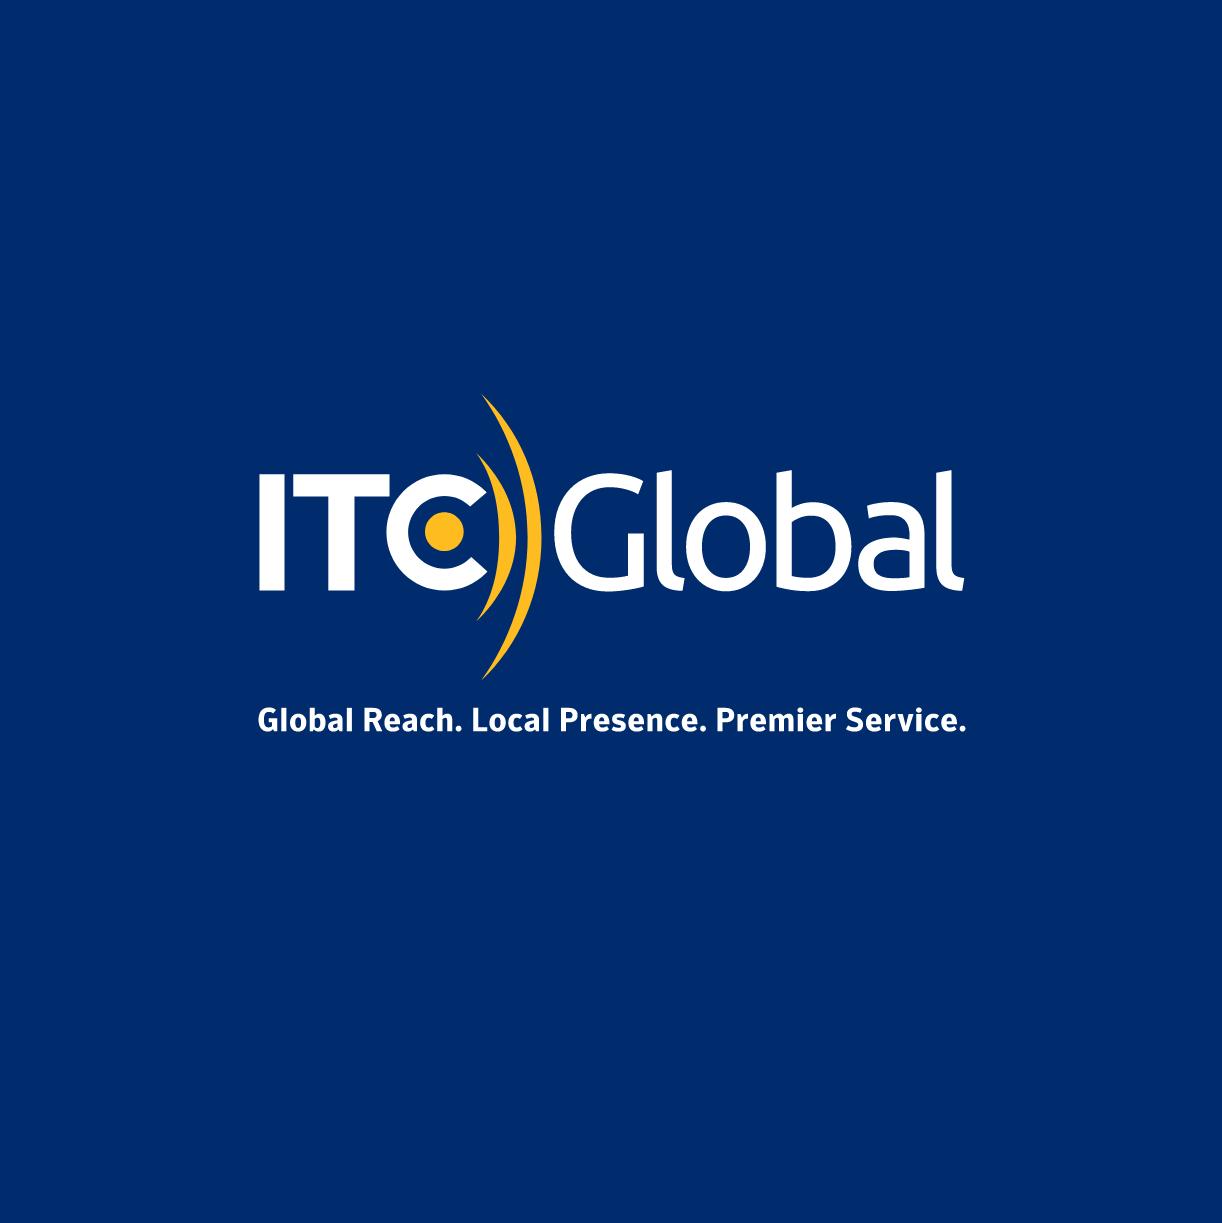 logo itc global right